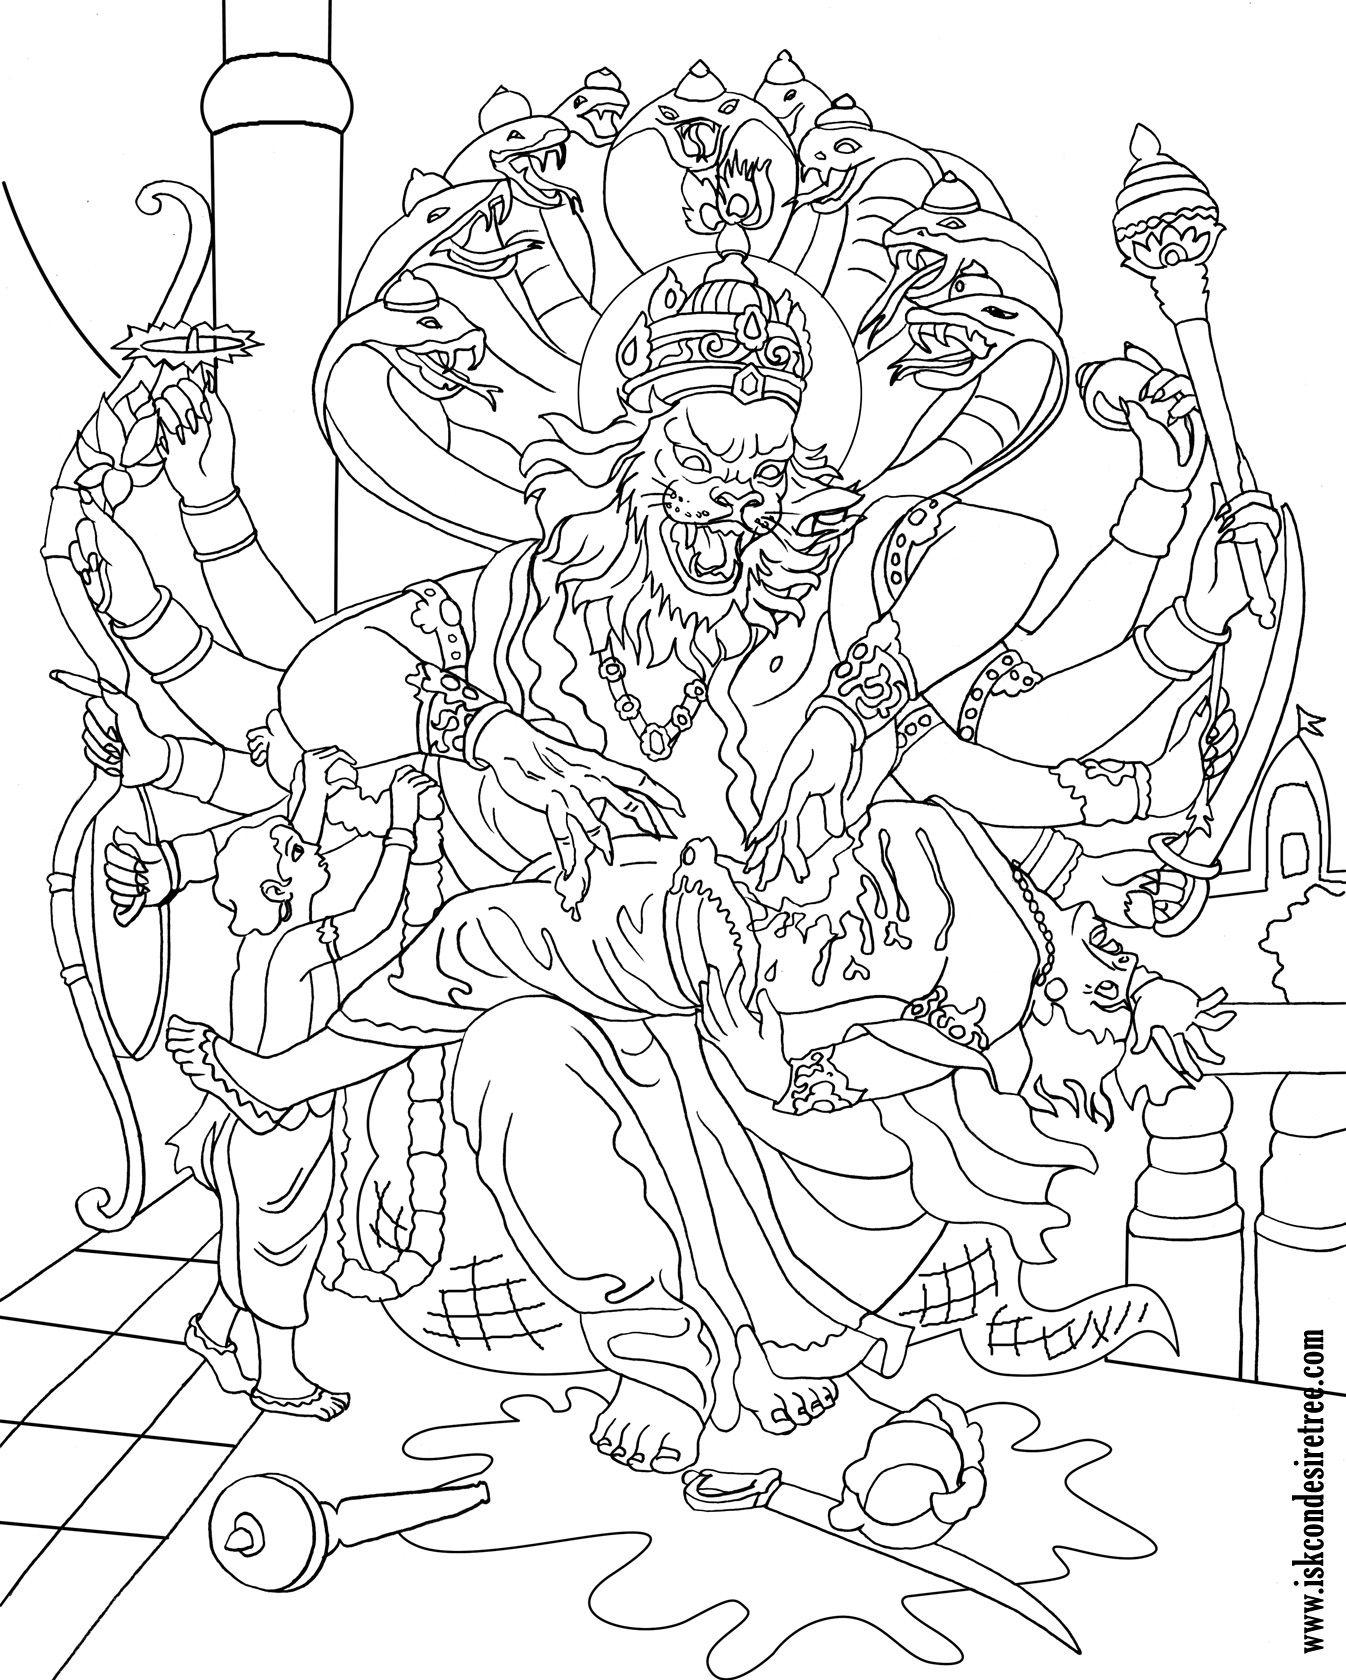 krishna coloring - Google Search | Krishna art, Art, Adult ...